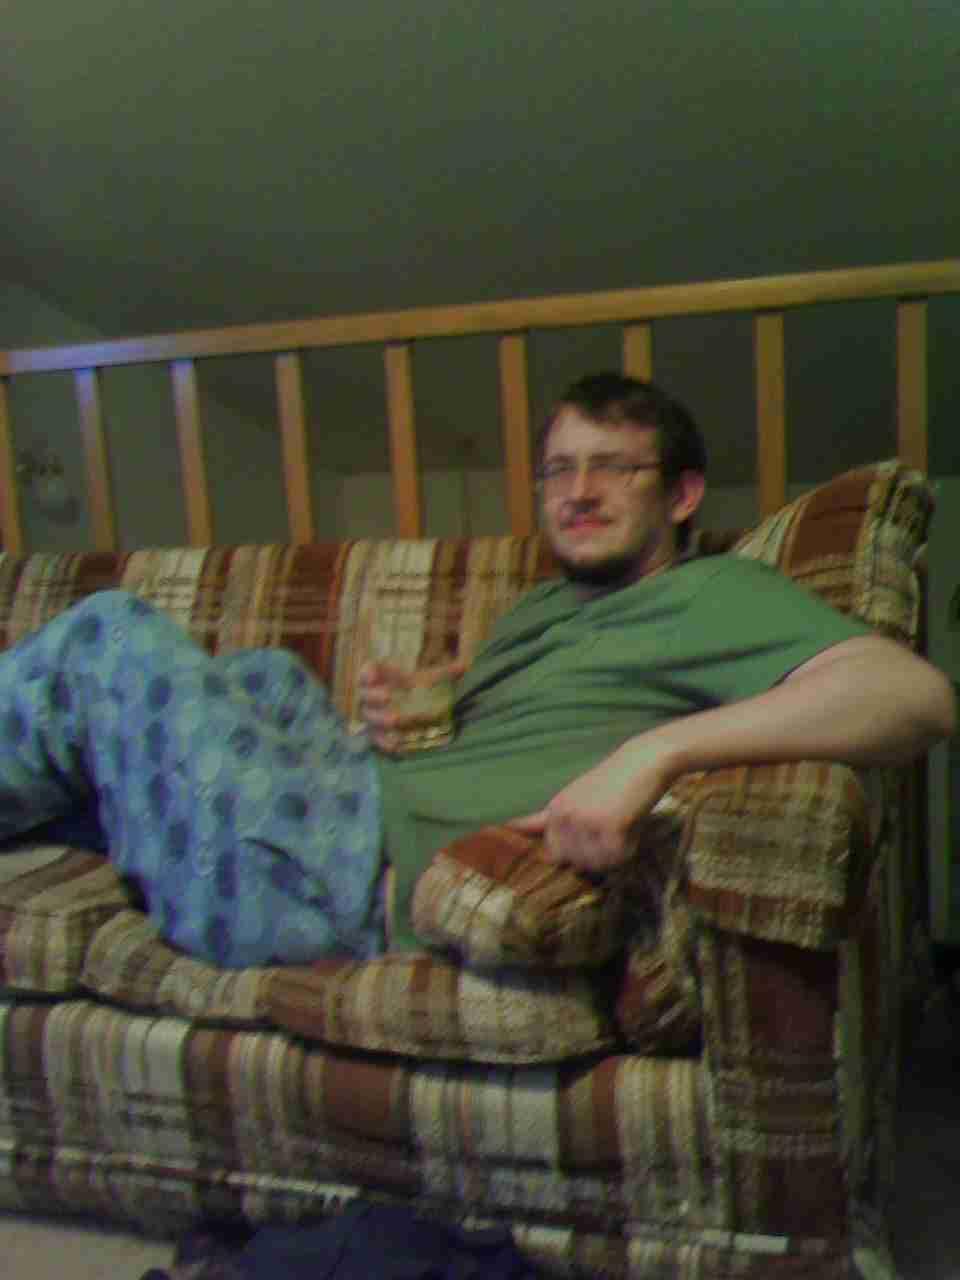 Chris Brodt in pajamas drinking whiskey